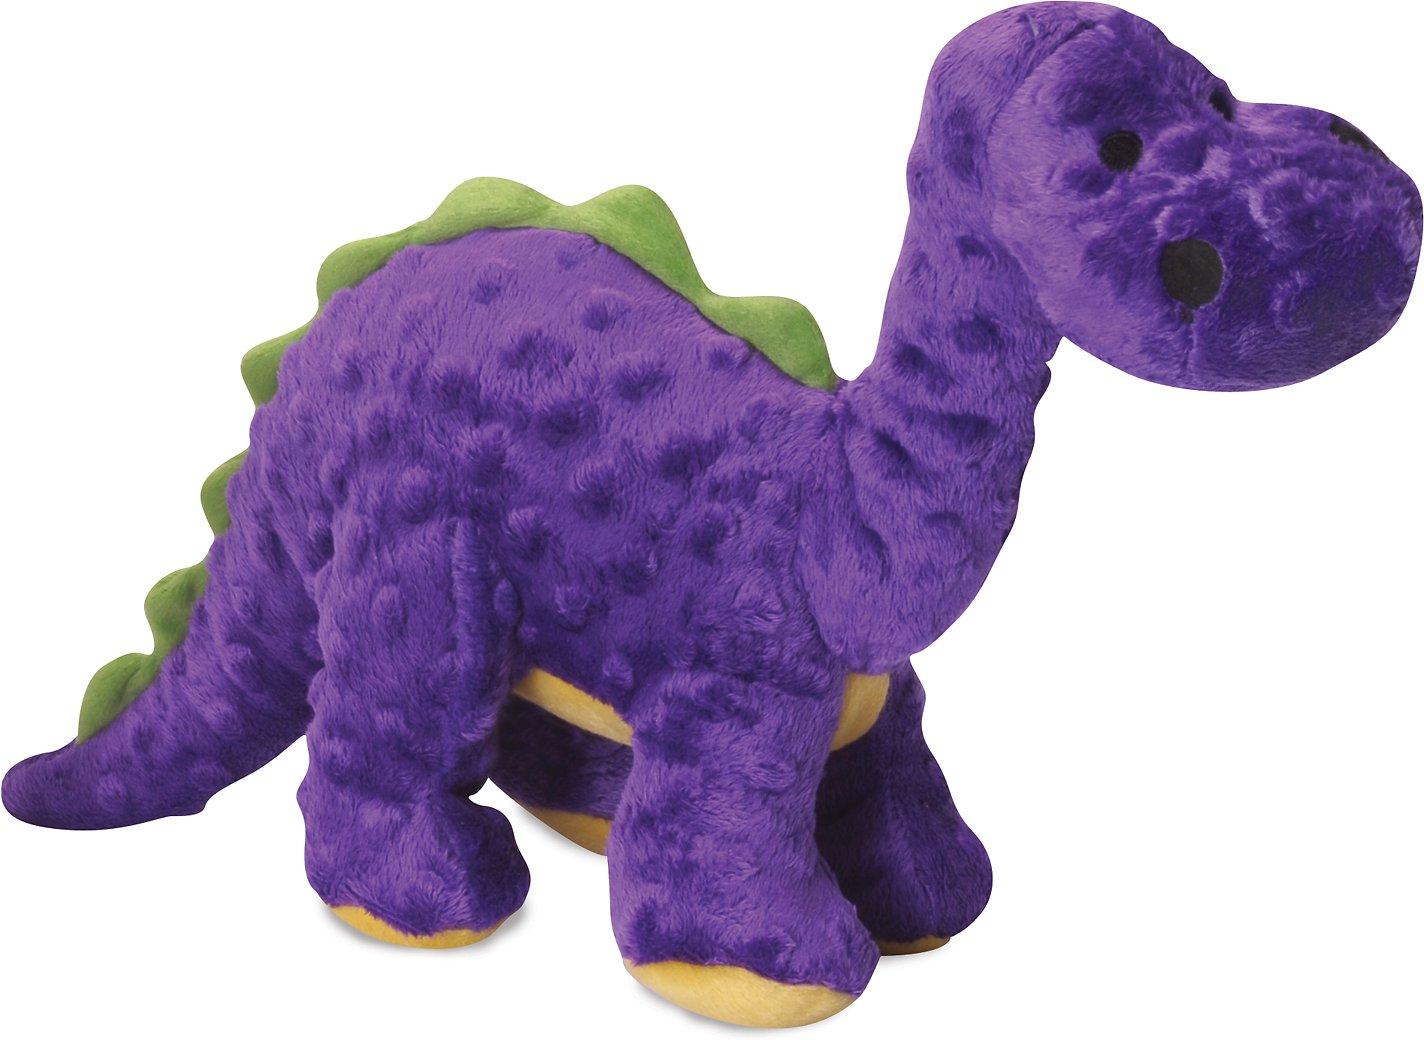 GoDog Dinos Chew Guard Bruto Dog Toy, Purple Image